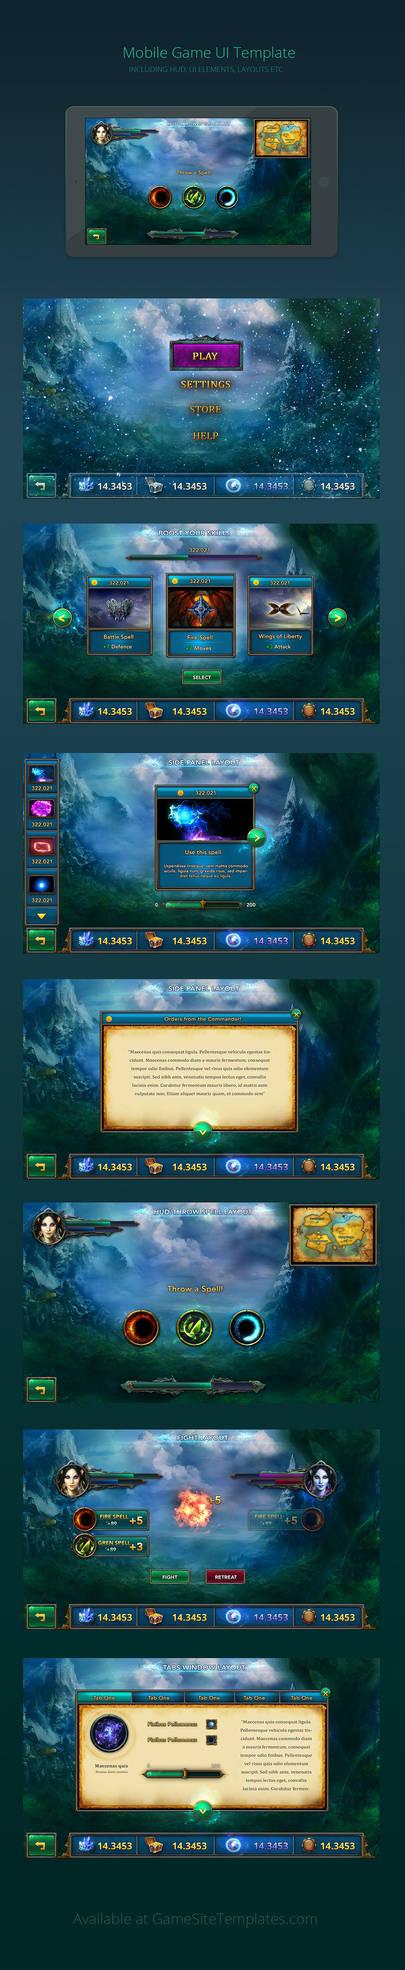 Mobile Game Fantasy UI